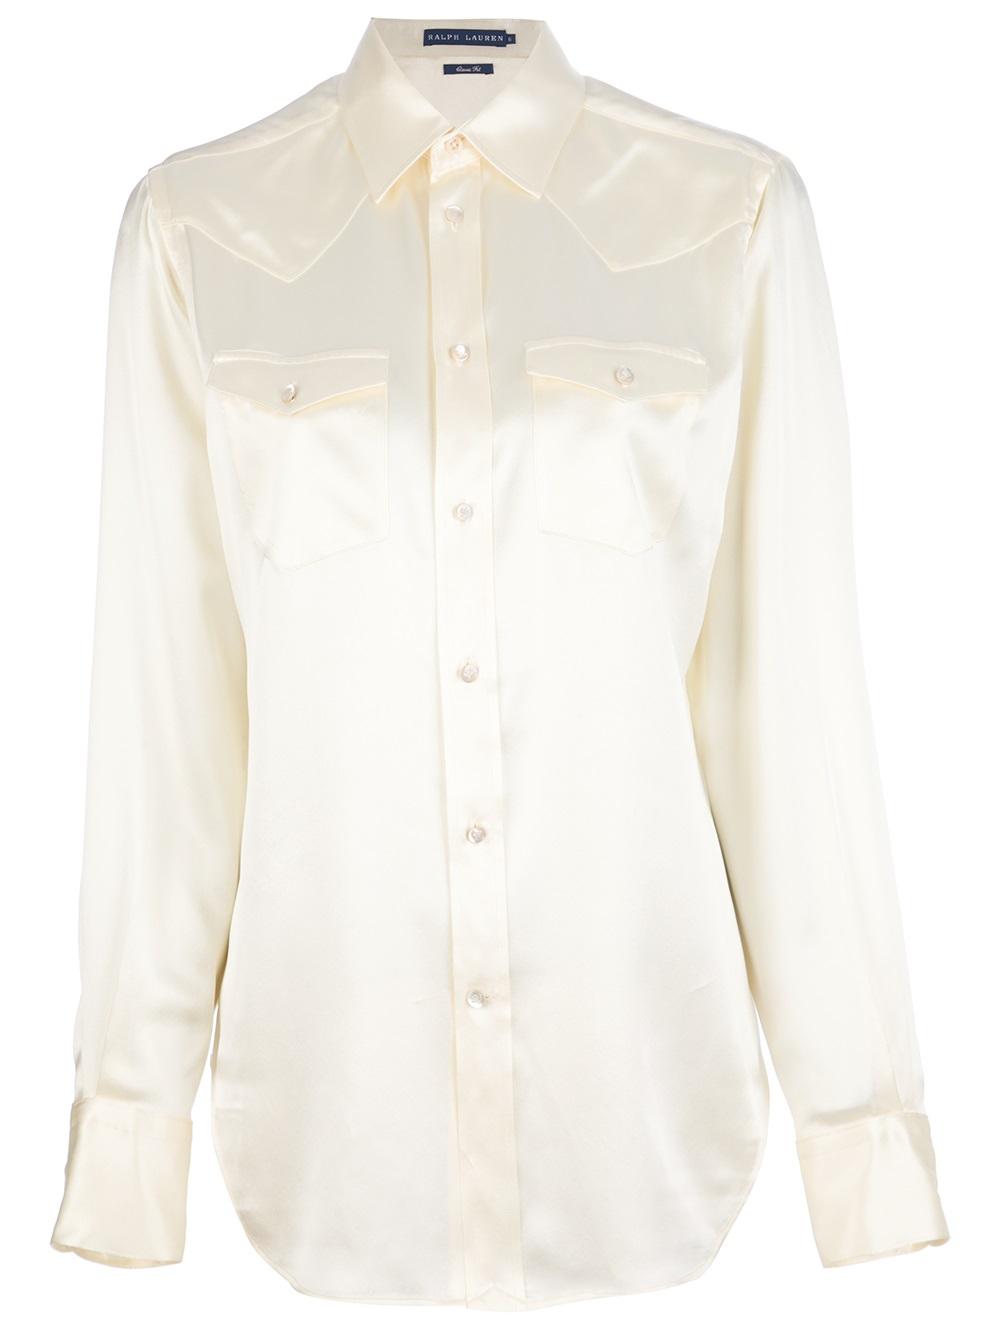 Lyst ralph lauren silk button down shirt in white for Silk button down shirt